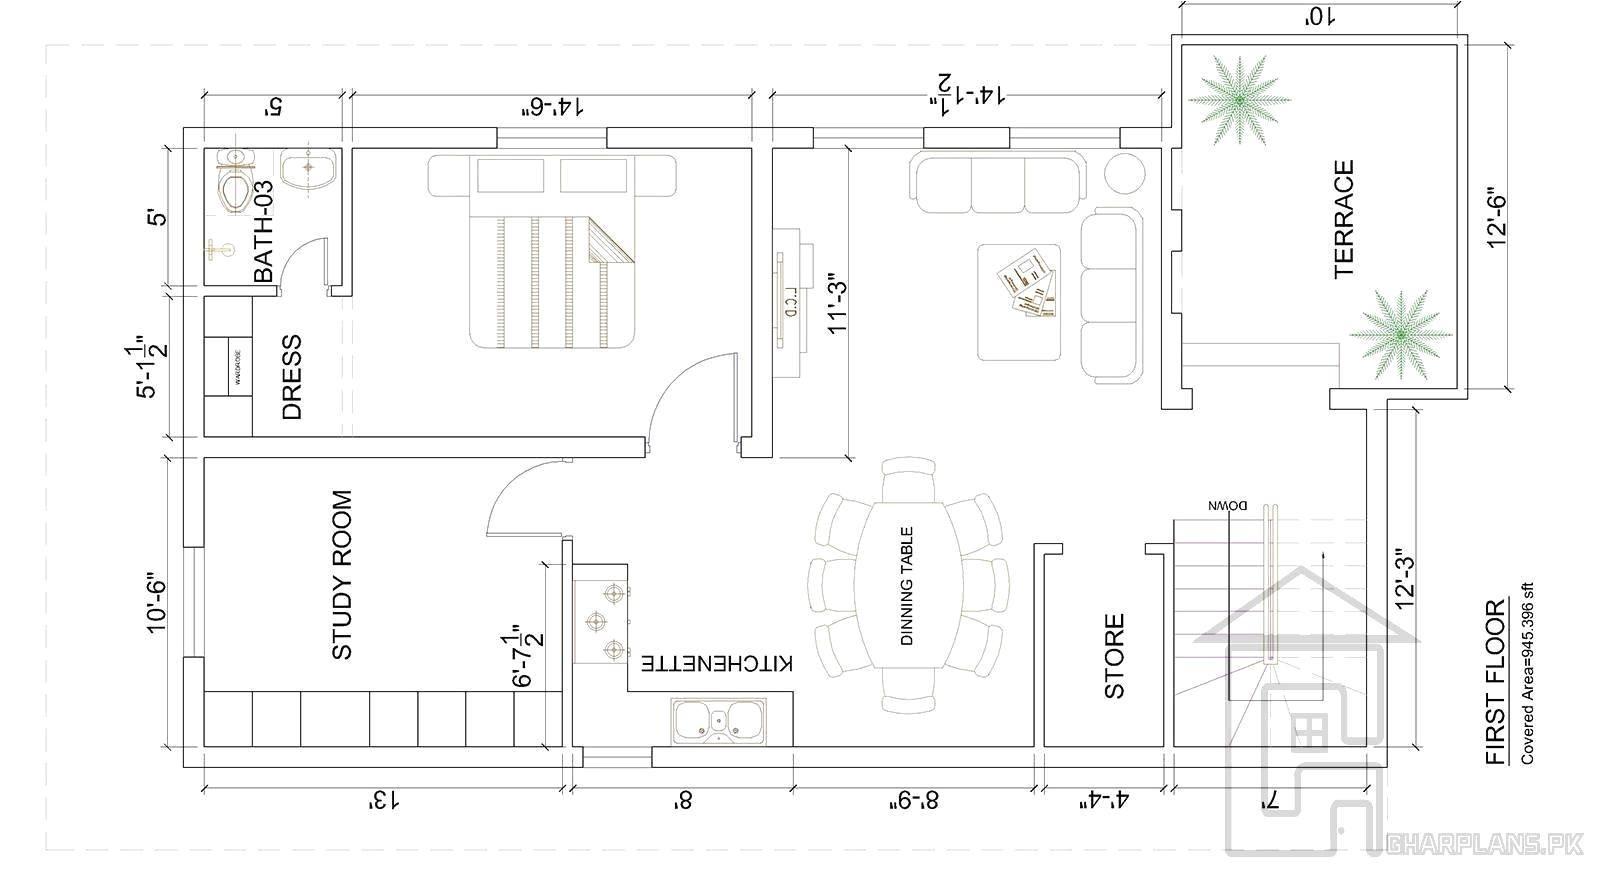 prevost rv floor plans elegant 2 story 4 bedroom floor plans fresh 2 bedroom home plans